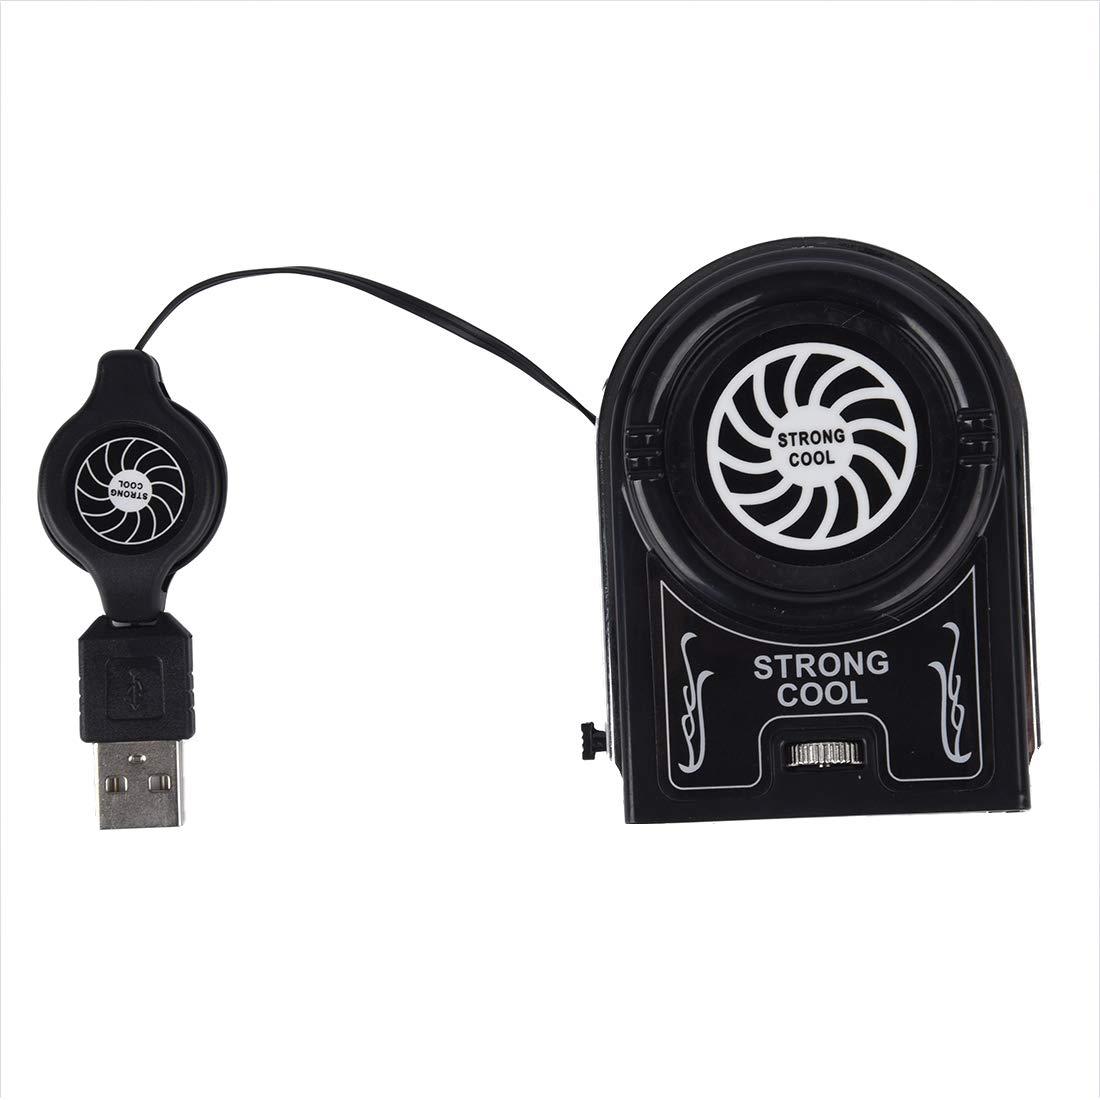 SODIAL(R) USB Mini Ventilador de Refrigeracion con LED Azul Portatil Solucion de Sobrecalentamiento para Notebook Ordenador Portatil 007283